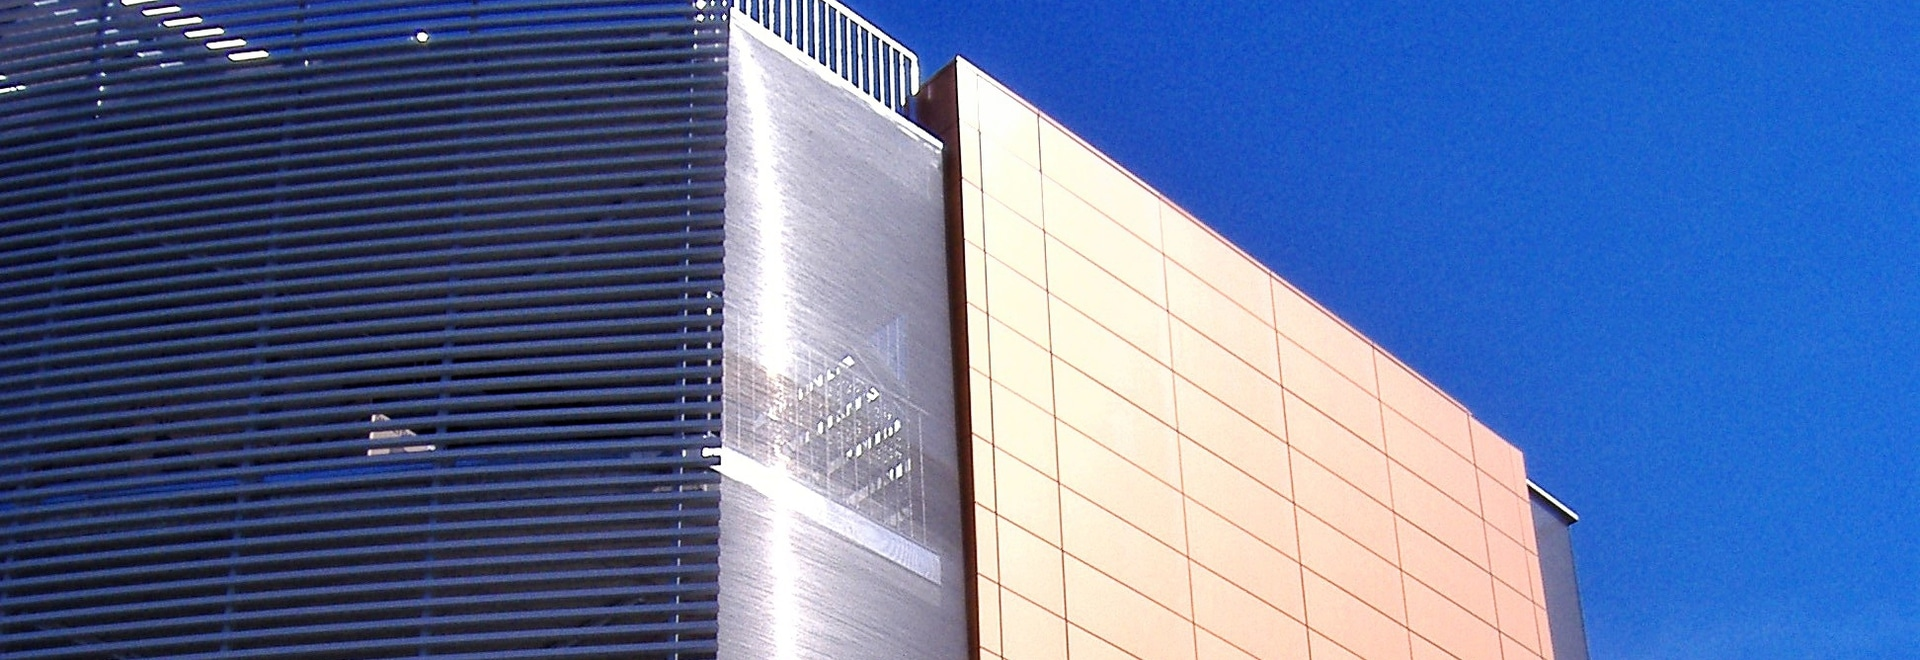 Malla metálica - hotel Ligresti